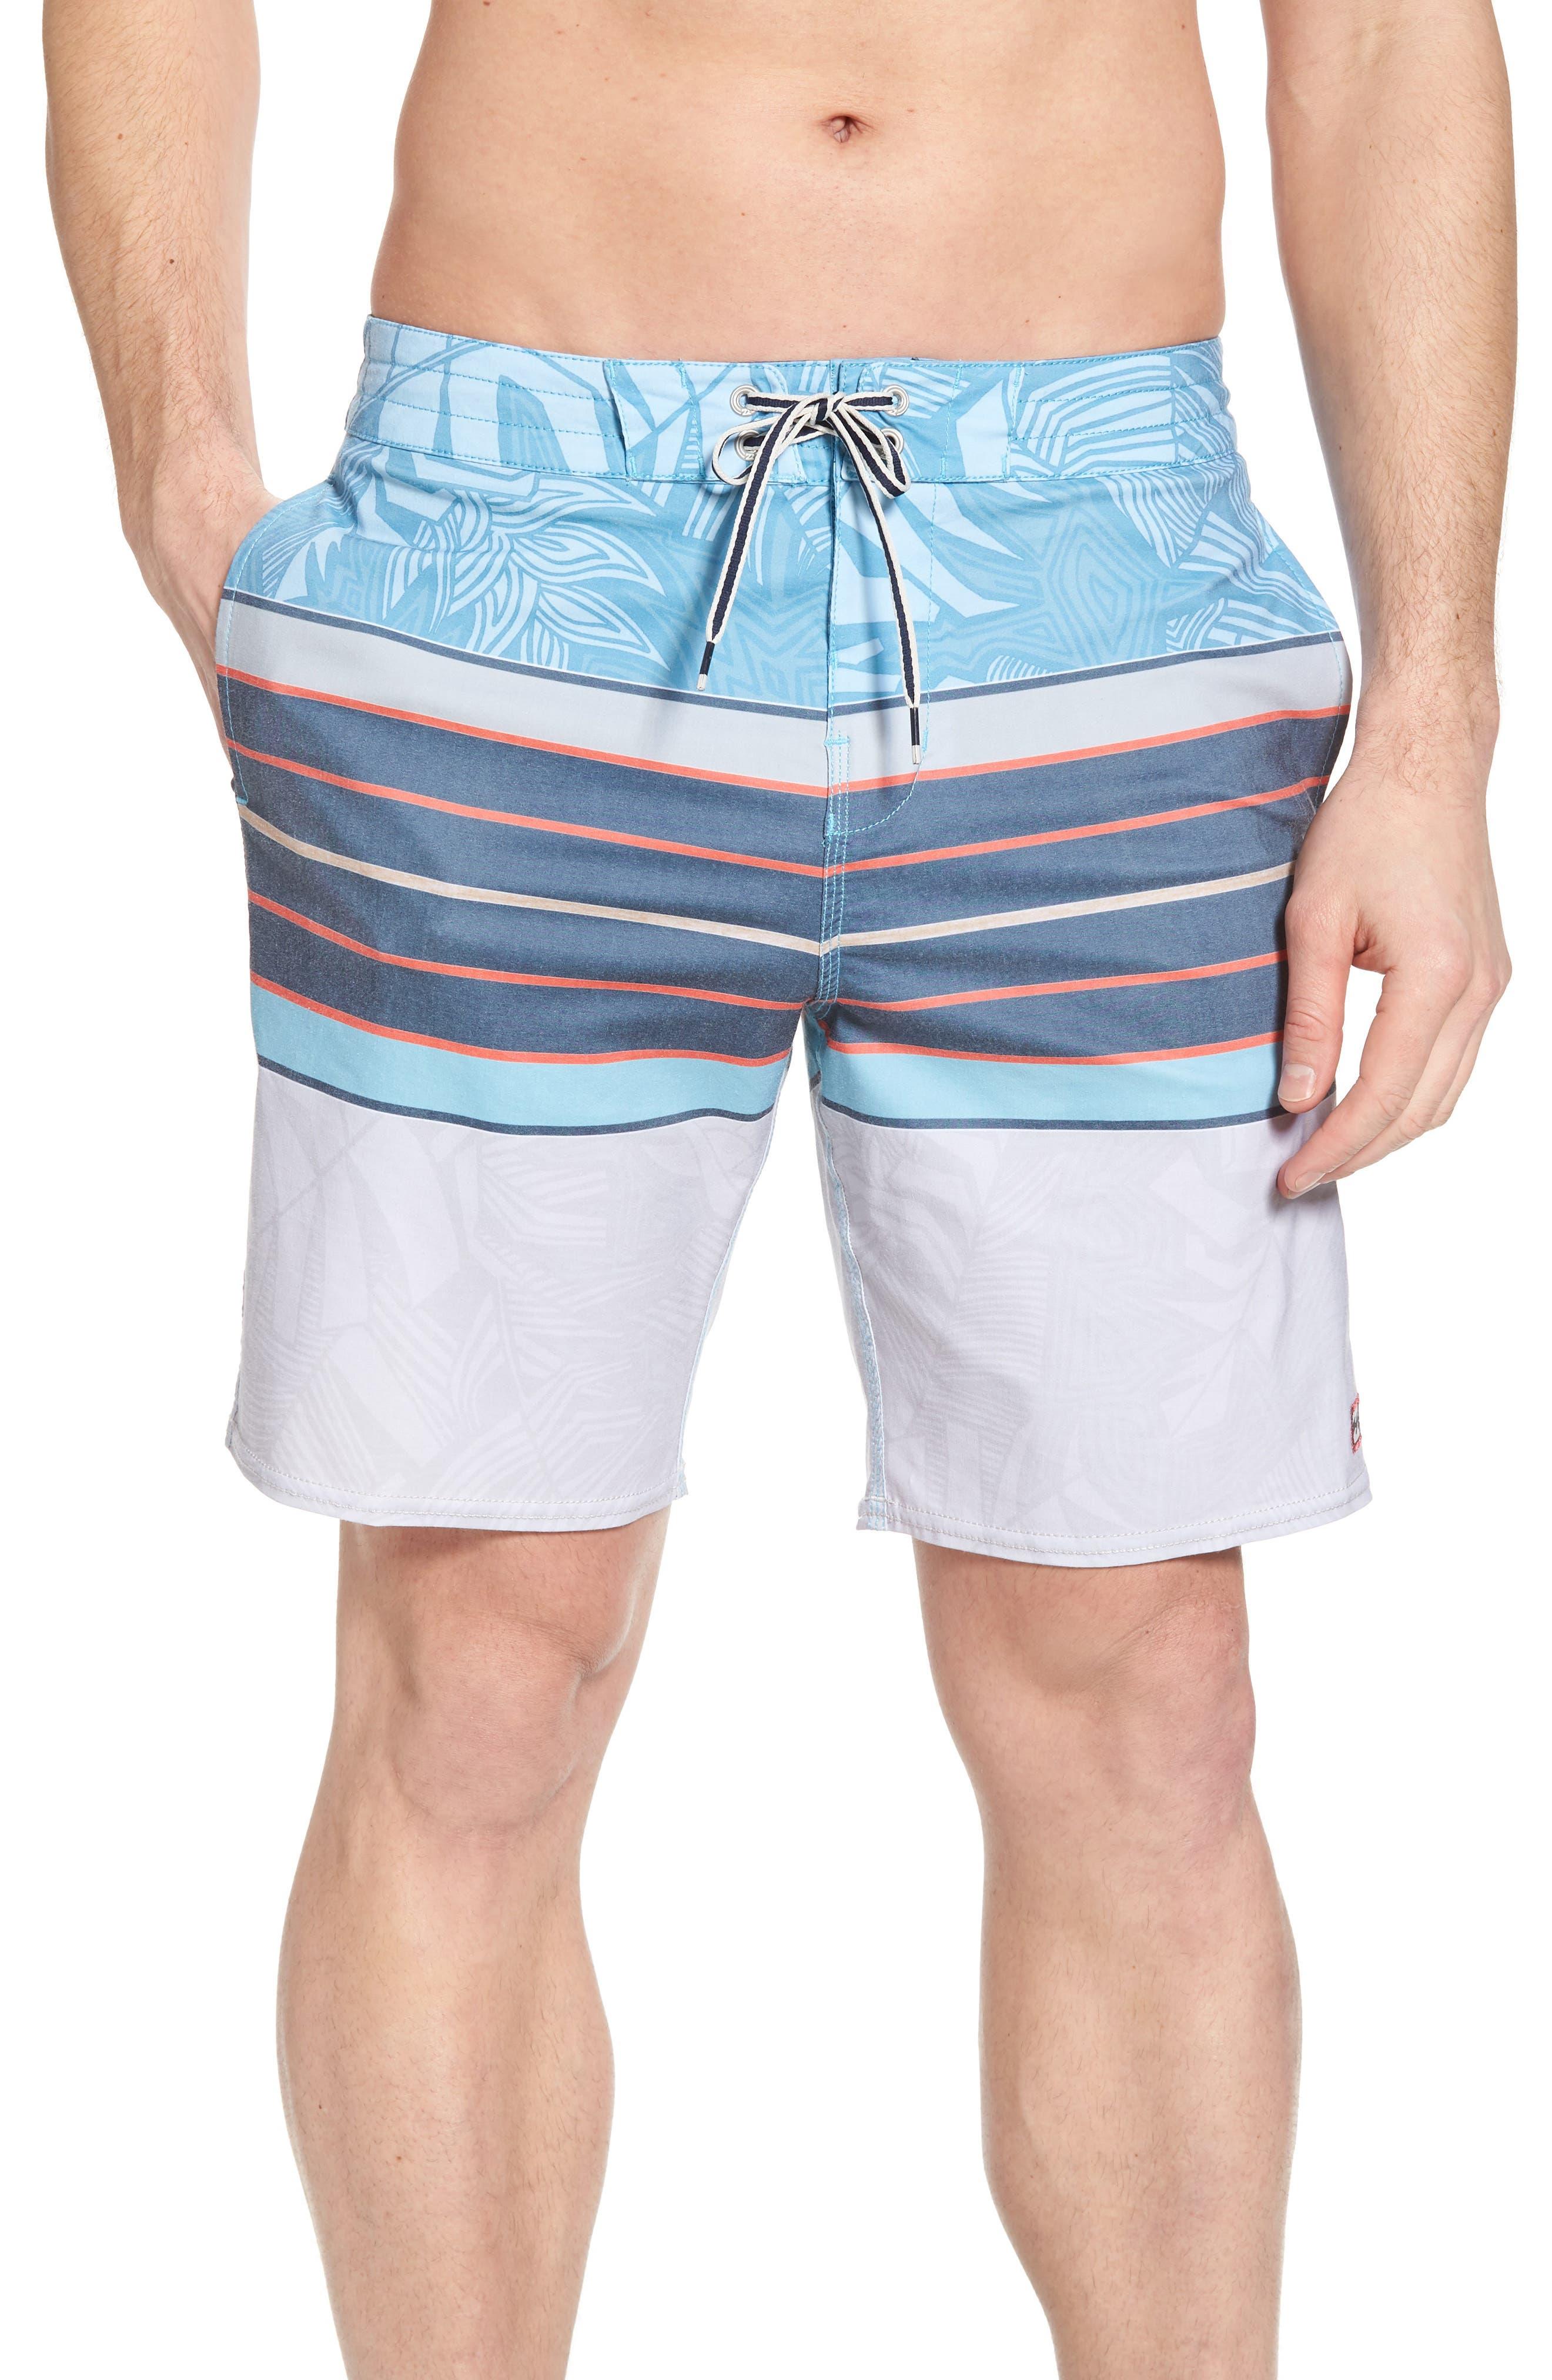 Stringer Lo Tides Board Shorts,                             Main thumbnail 1, color,                             Blue